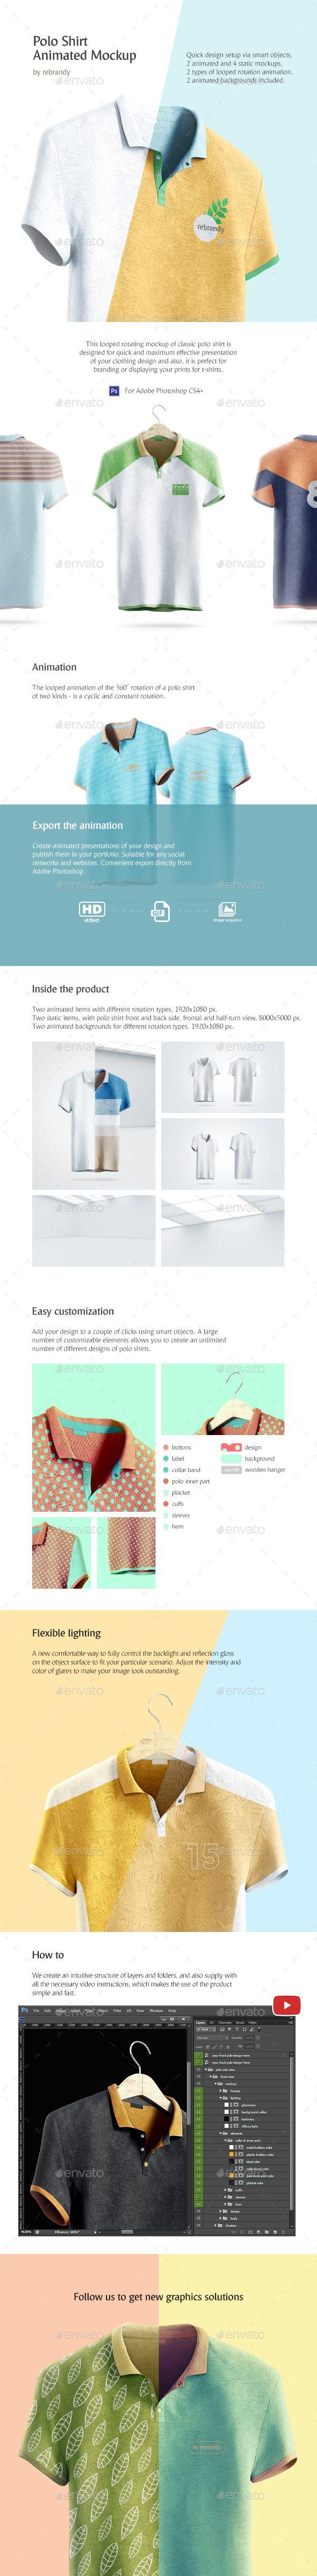 Download Polo Shirt Animated Mockup Mockup Clothing Mockup Mockup Design